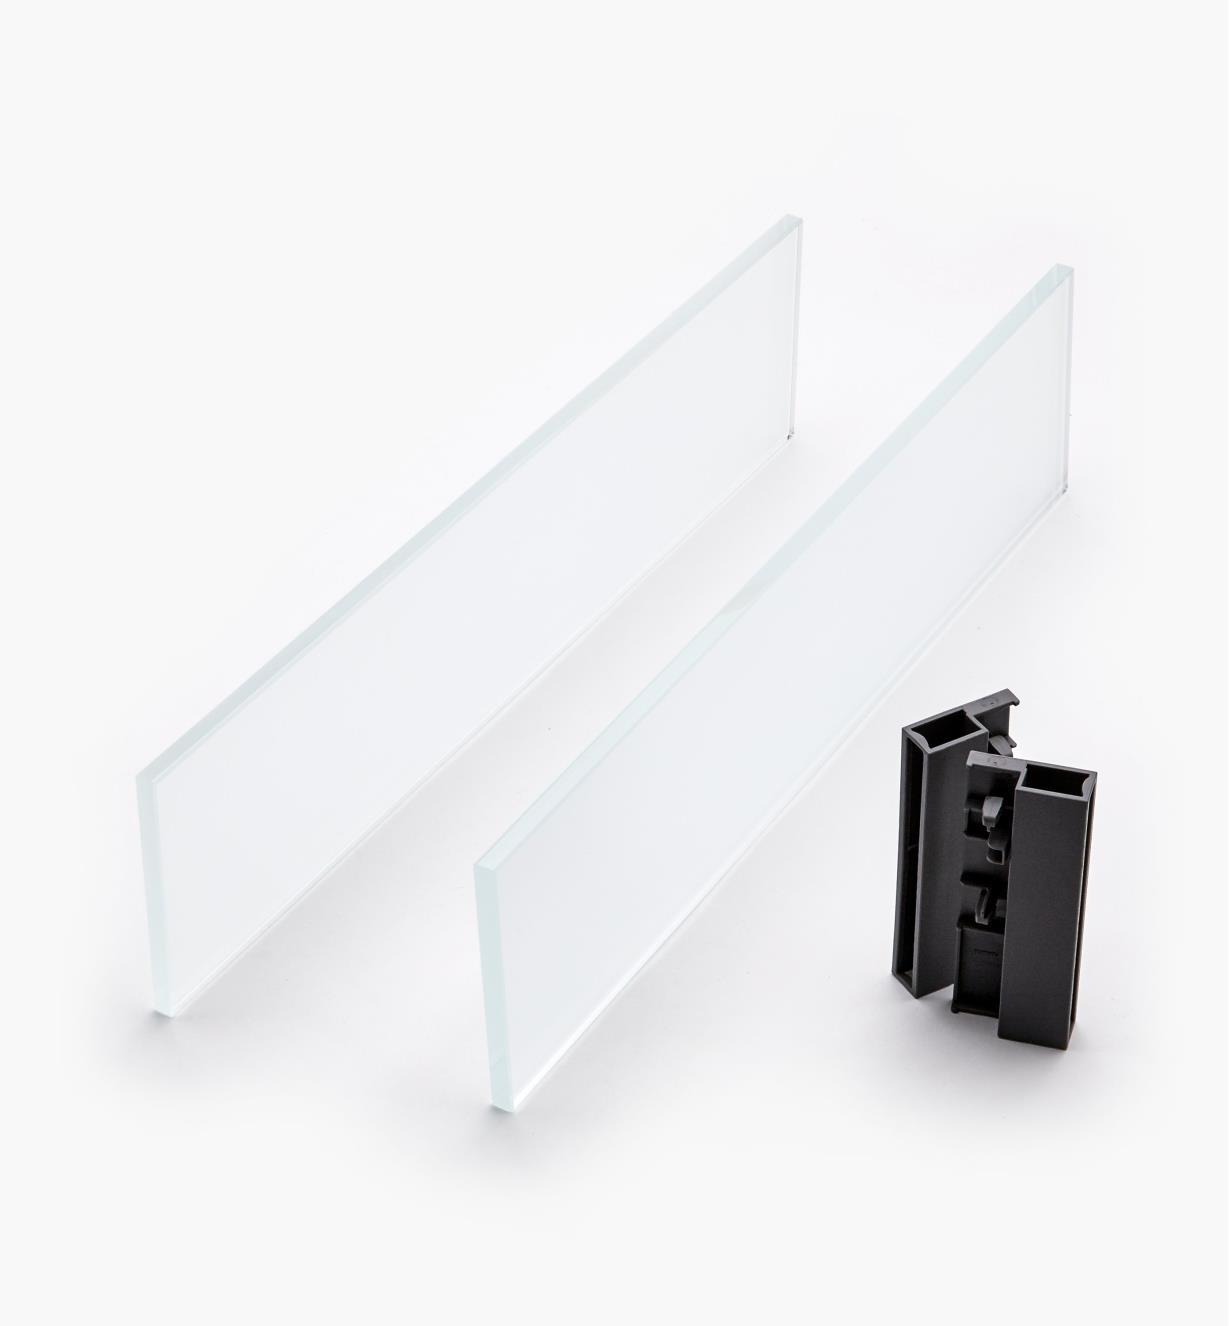 02K2841 - Glass Insert Panels for Blum Tandembox Antaro Soft-Close Type D 400mm Drawer Kit